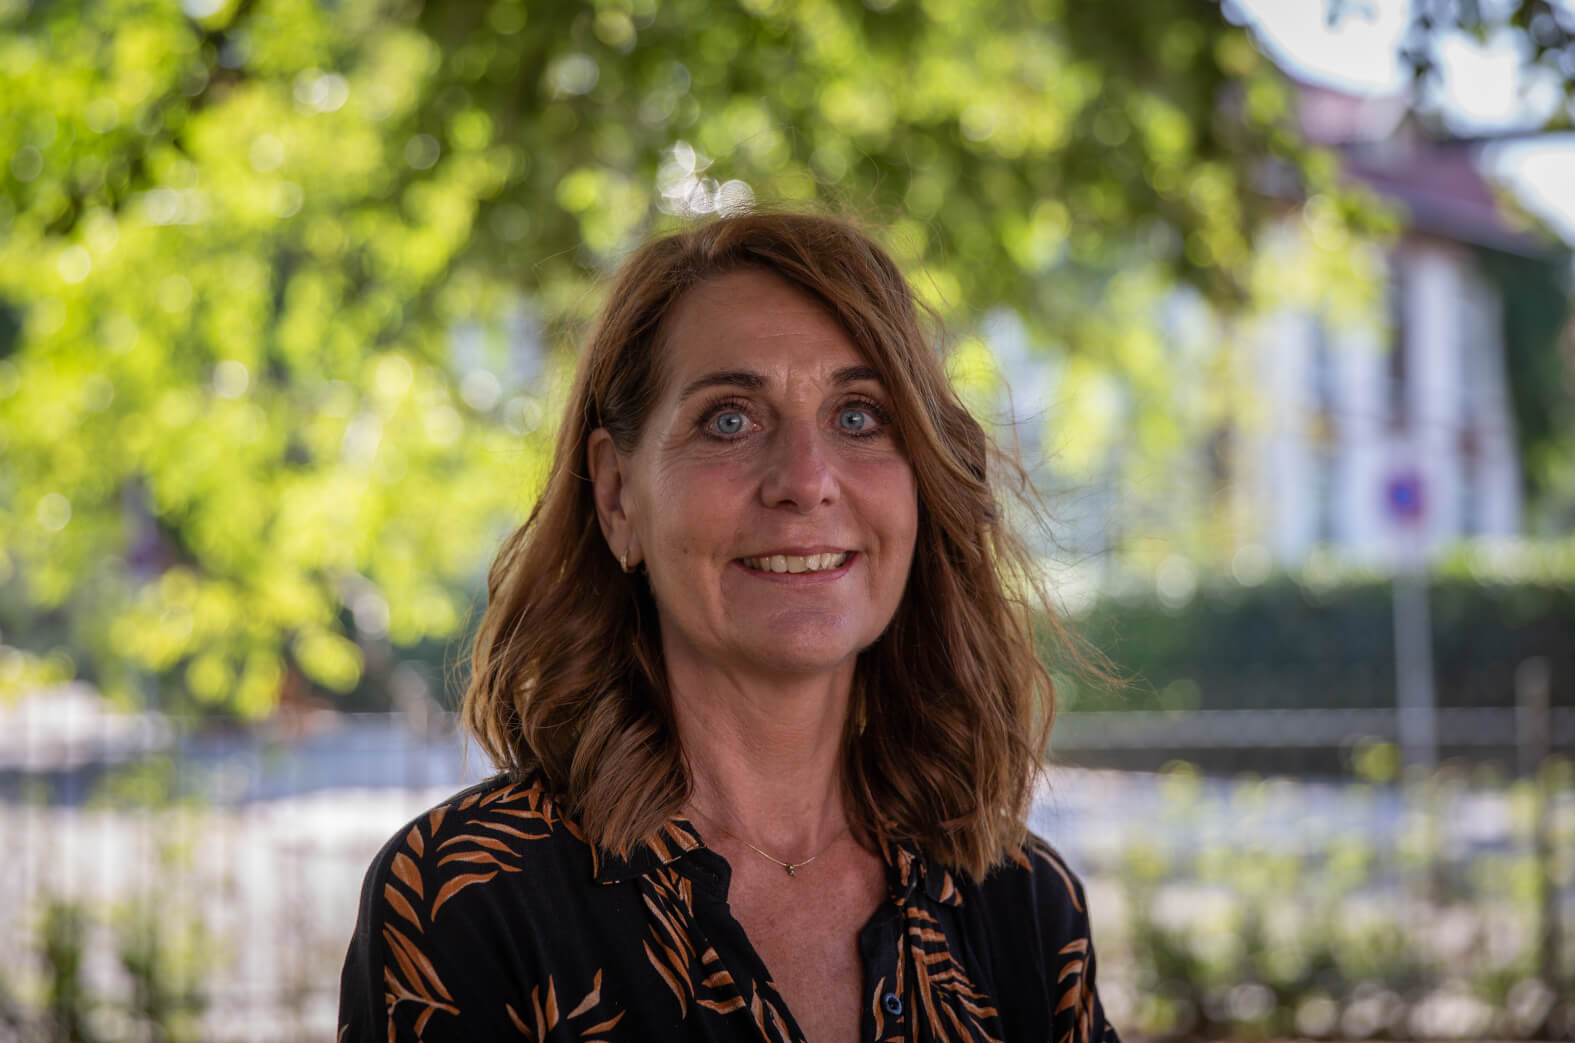 Anna Veenendaal